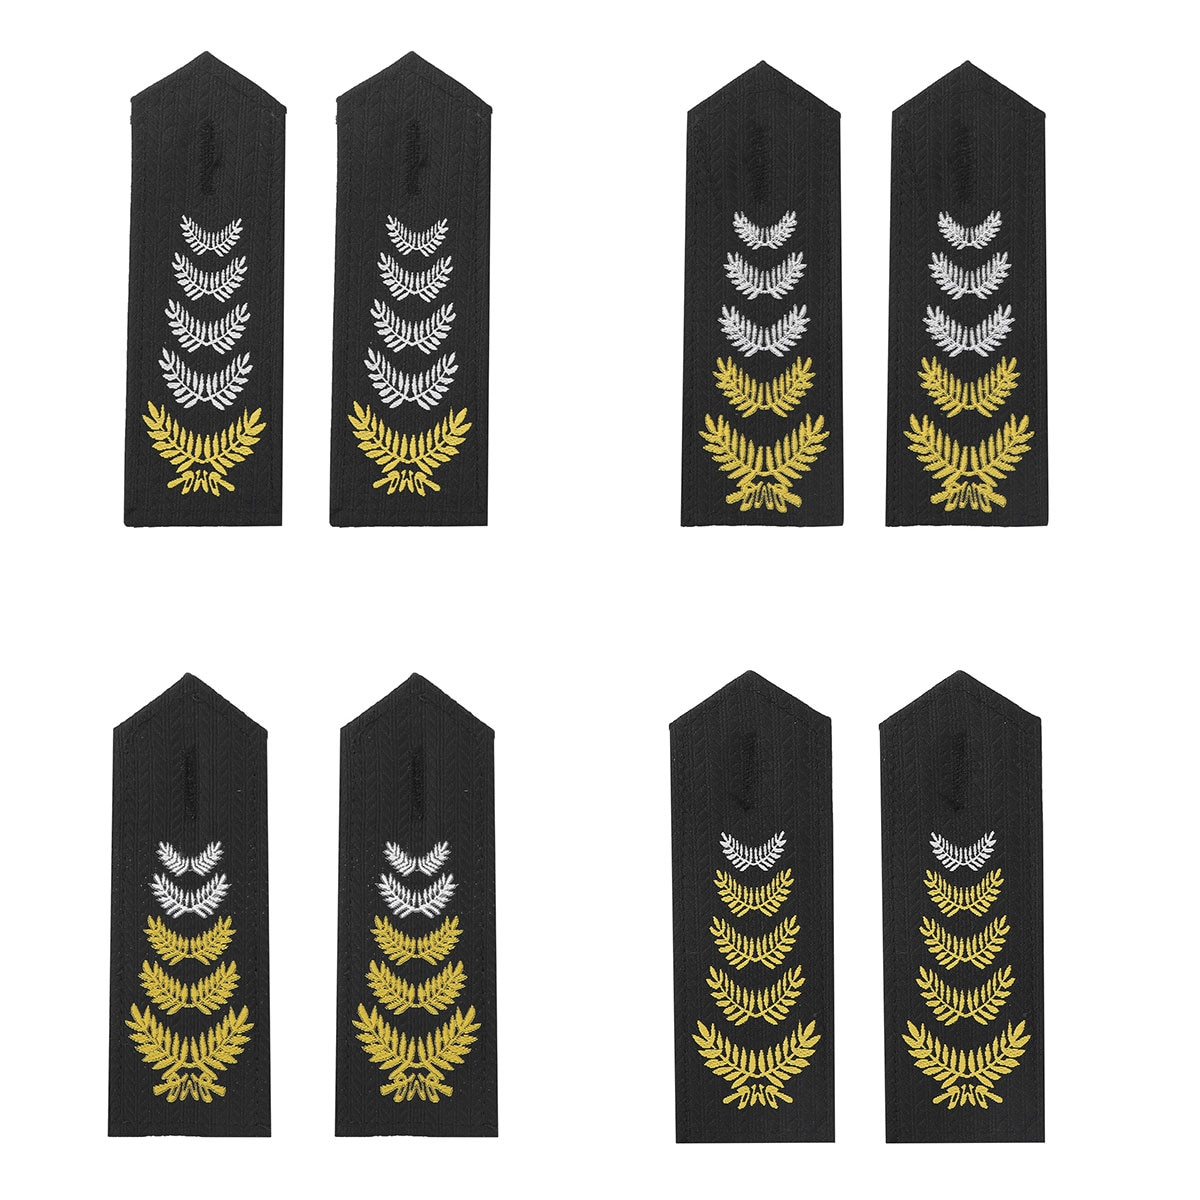 1 par de hombreras de uniforme profesional de Epaulets de camisa de oficial de seguridad tradicional, bandanas DE TRIGO bordado DIY Epaulette